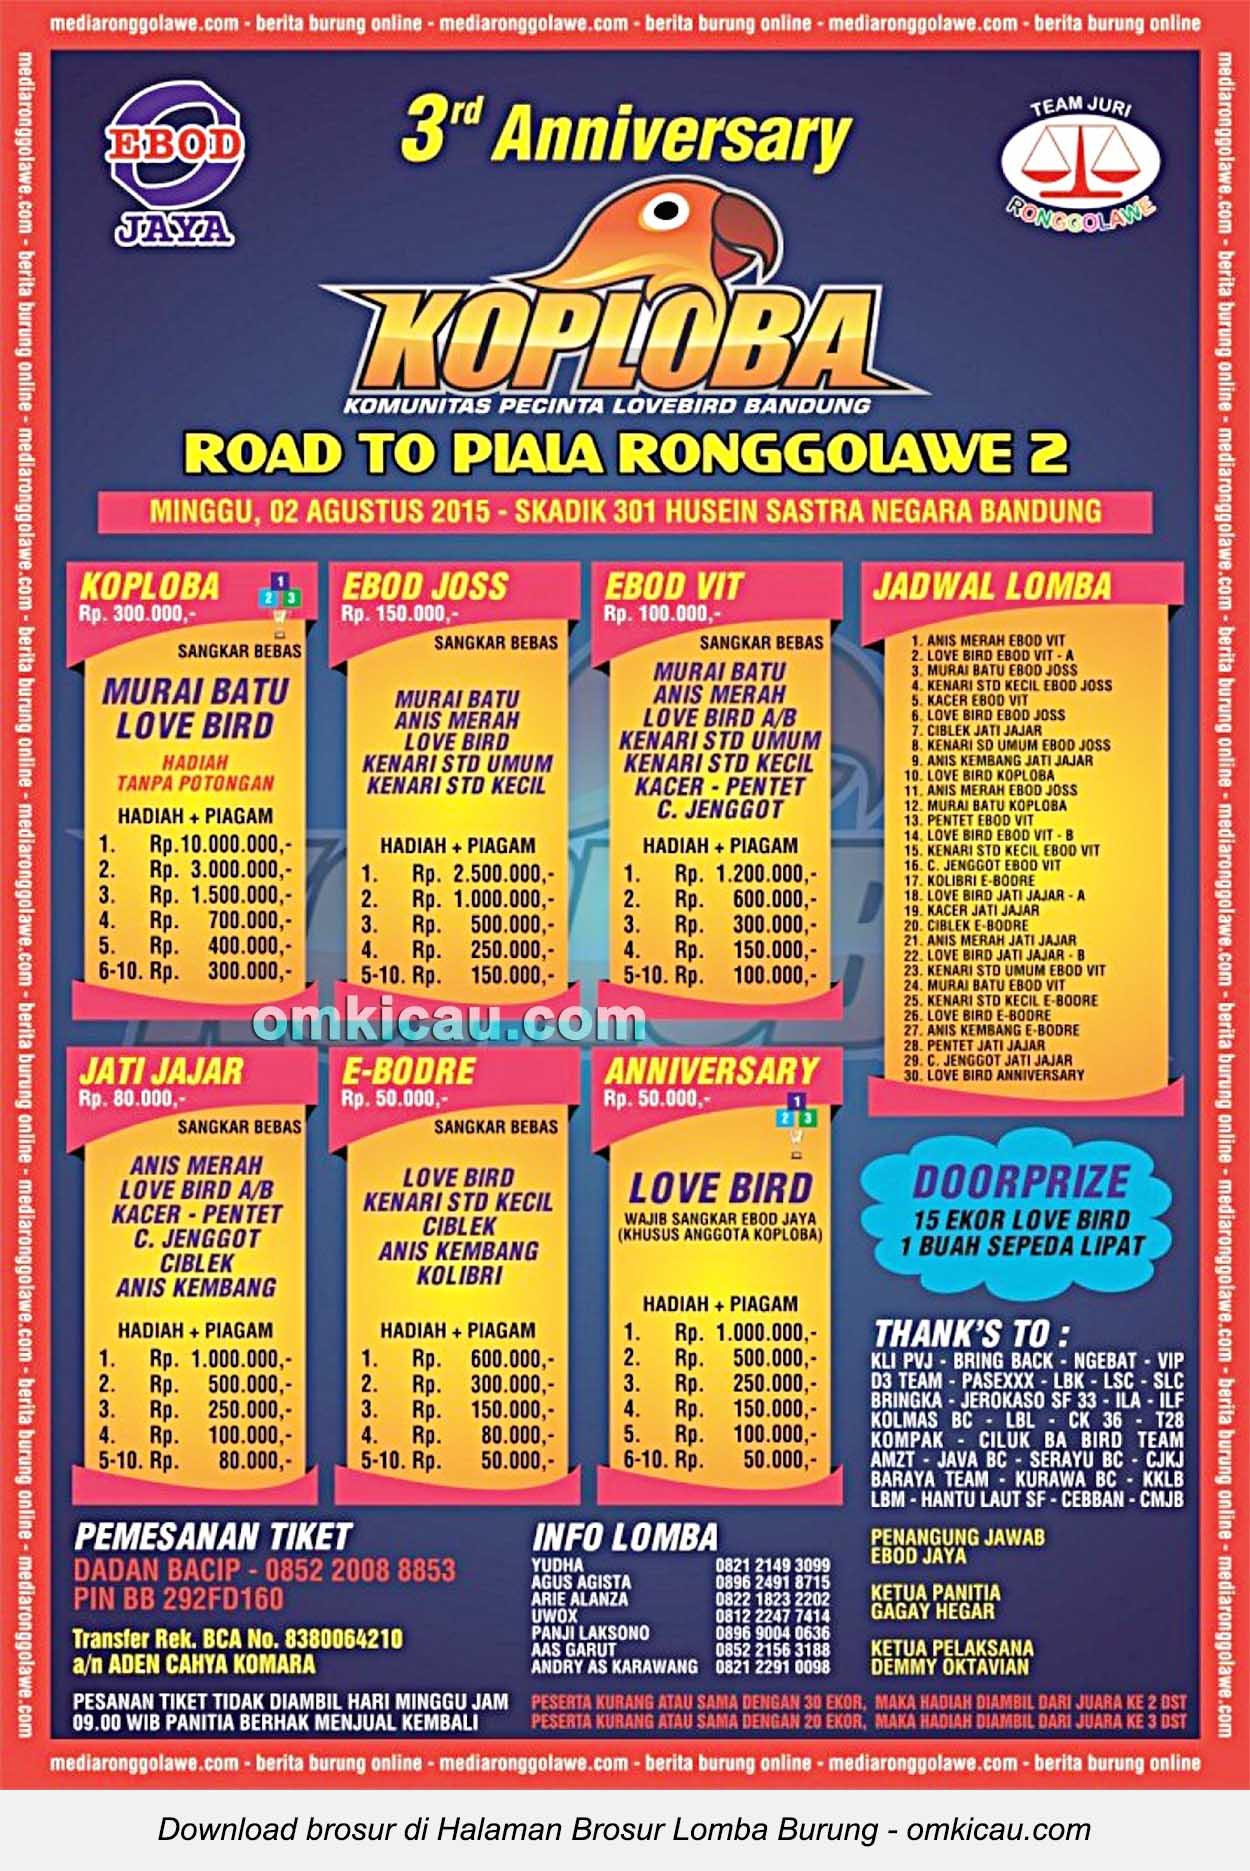 Brosur Lomba Burung Berkicau Koploba Road to Piala Ronggolawe, Bandung, 2 Agustus 2015